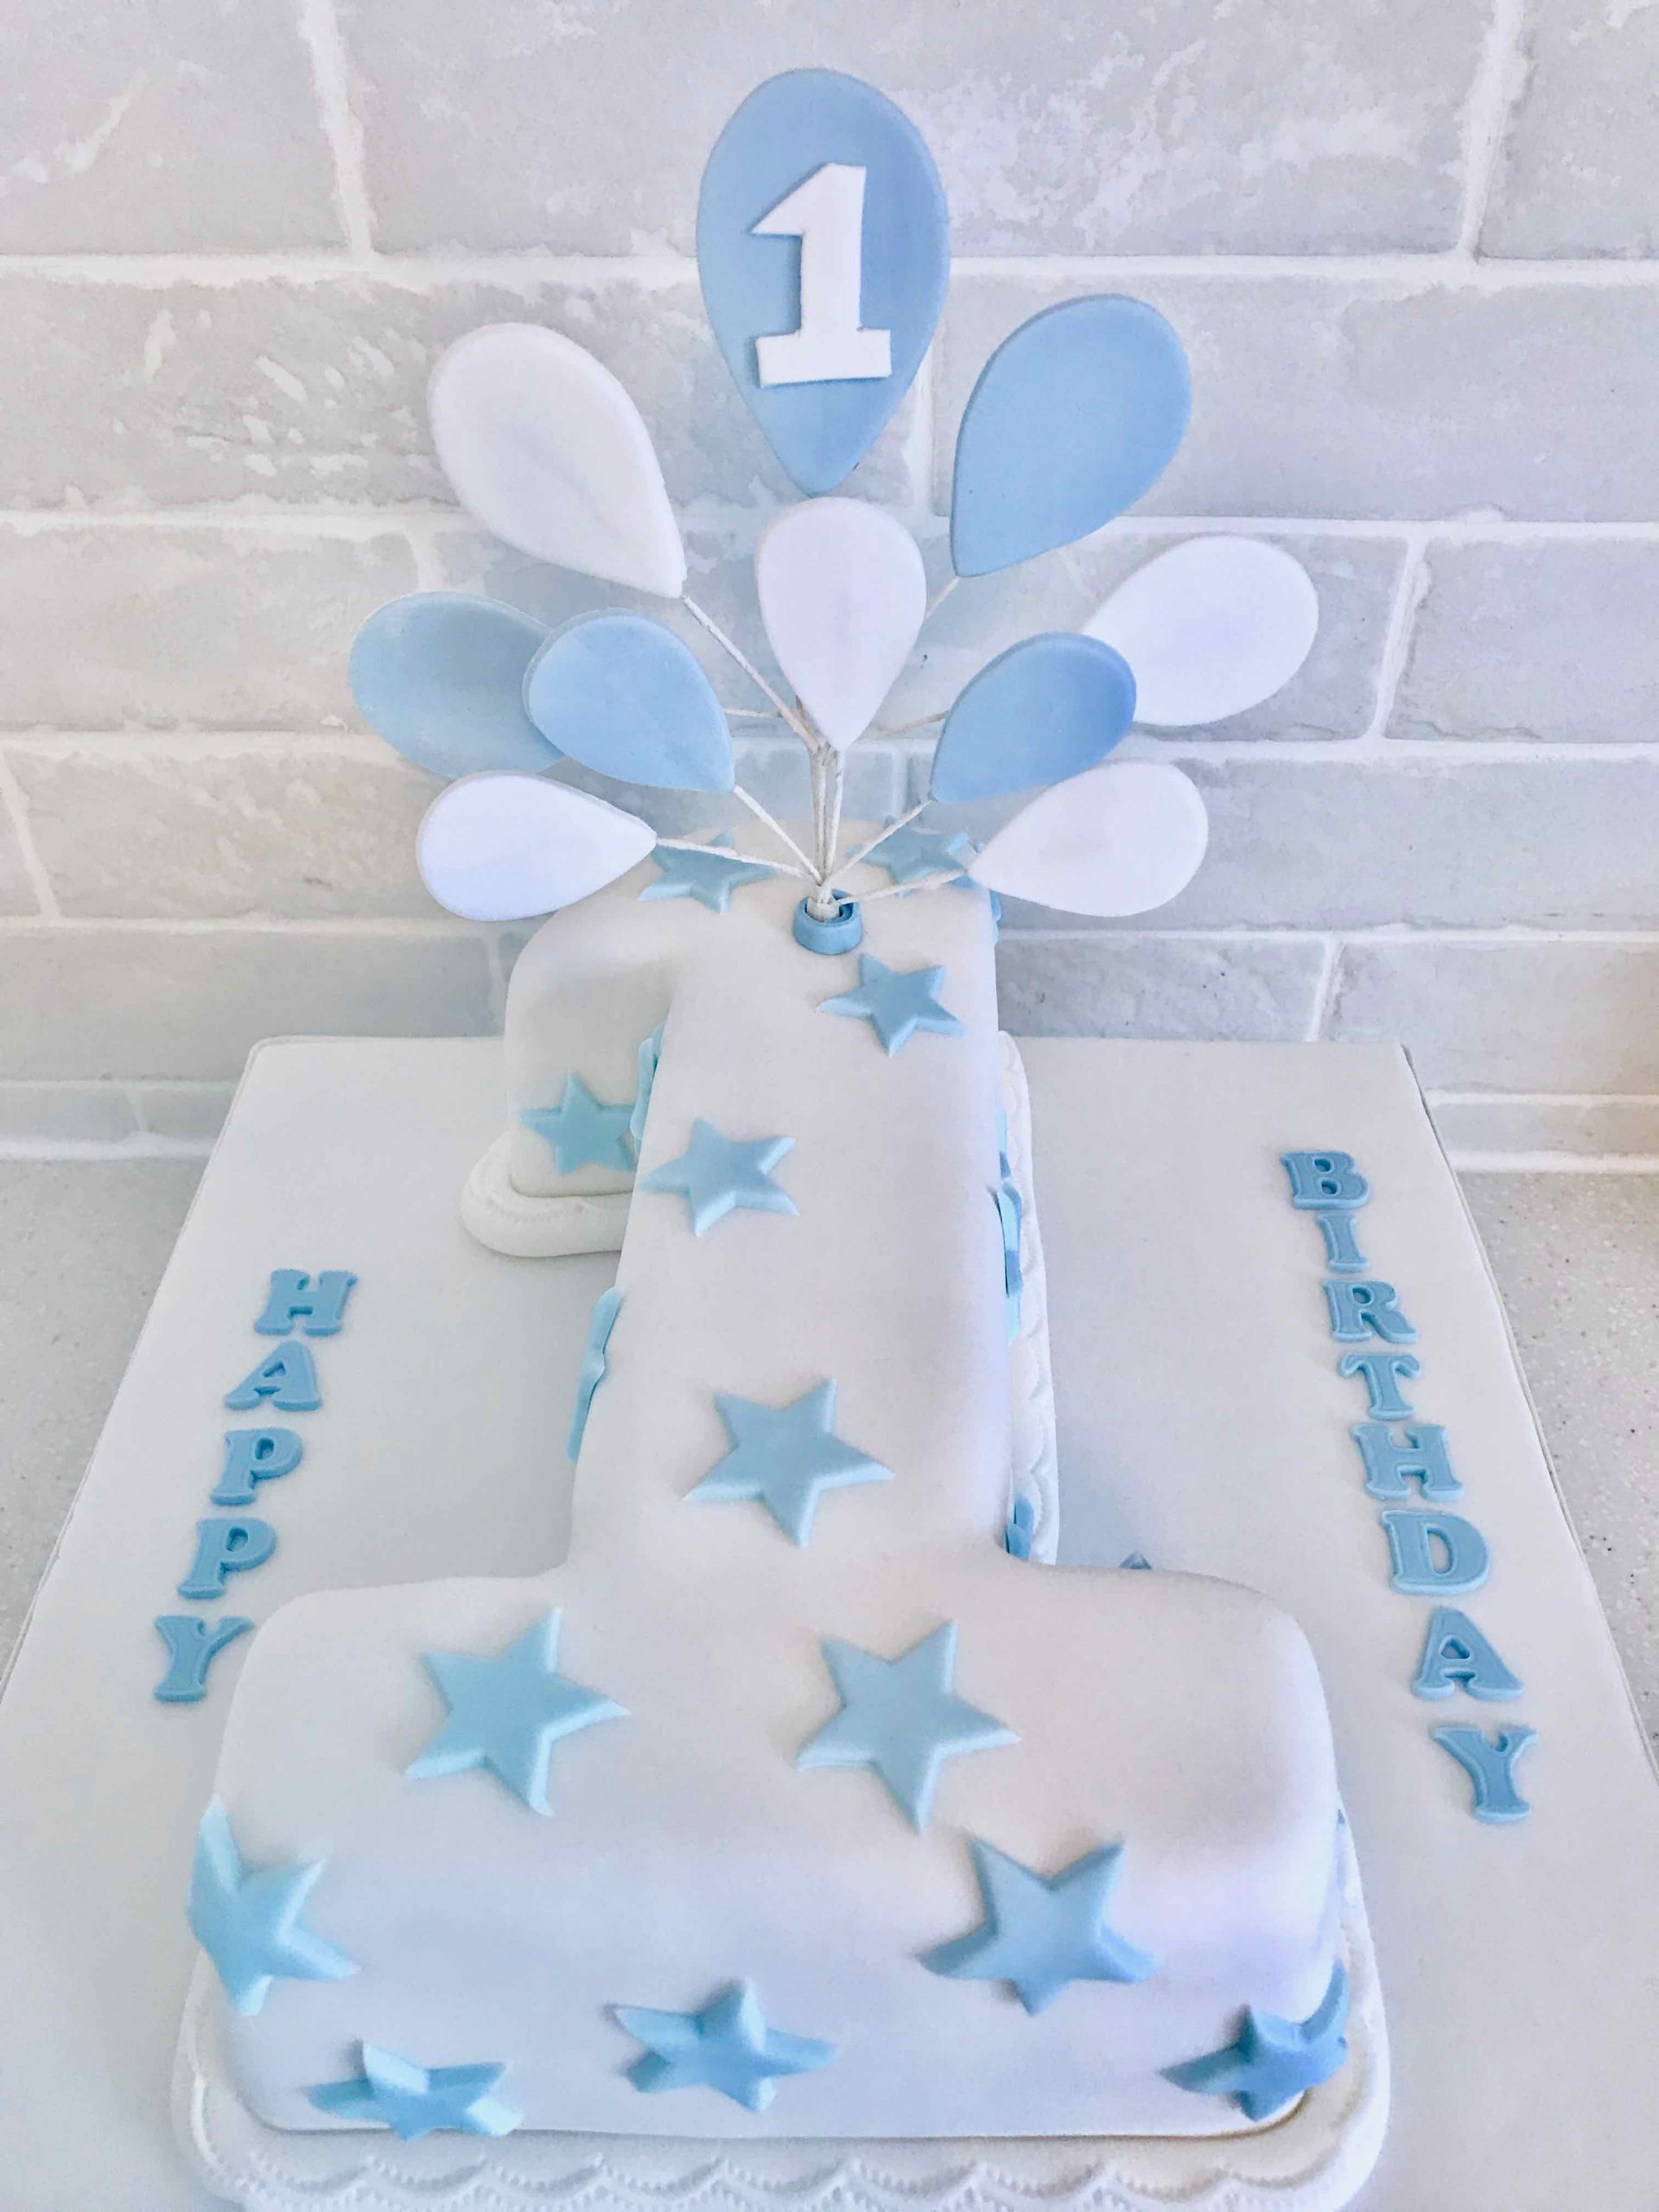 Number 1 Birthday Cake  First Birthday Number 1 Cake Serendipity Cake pany